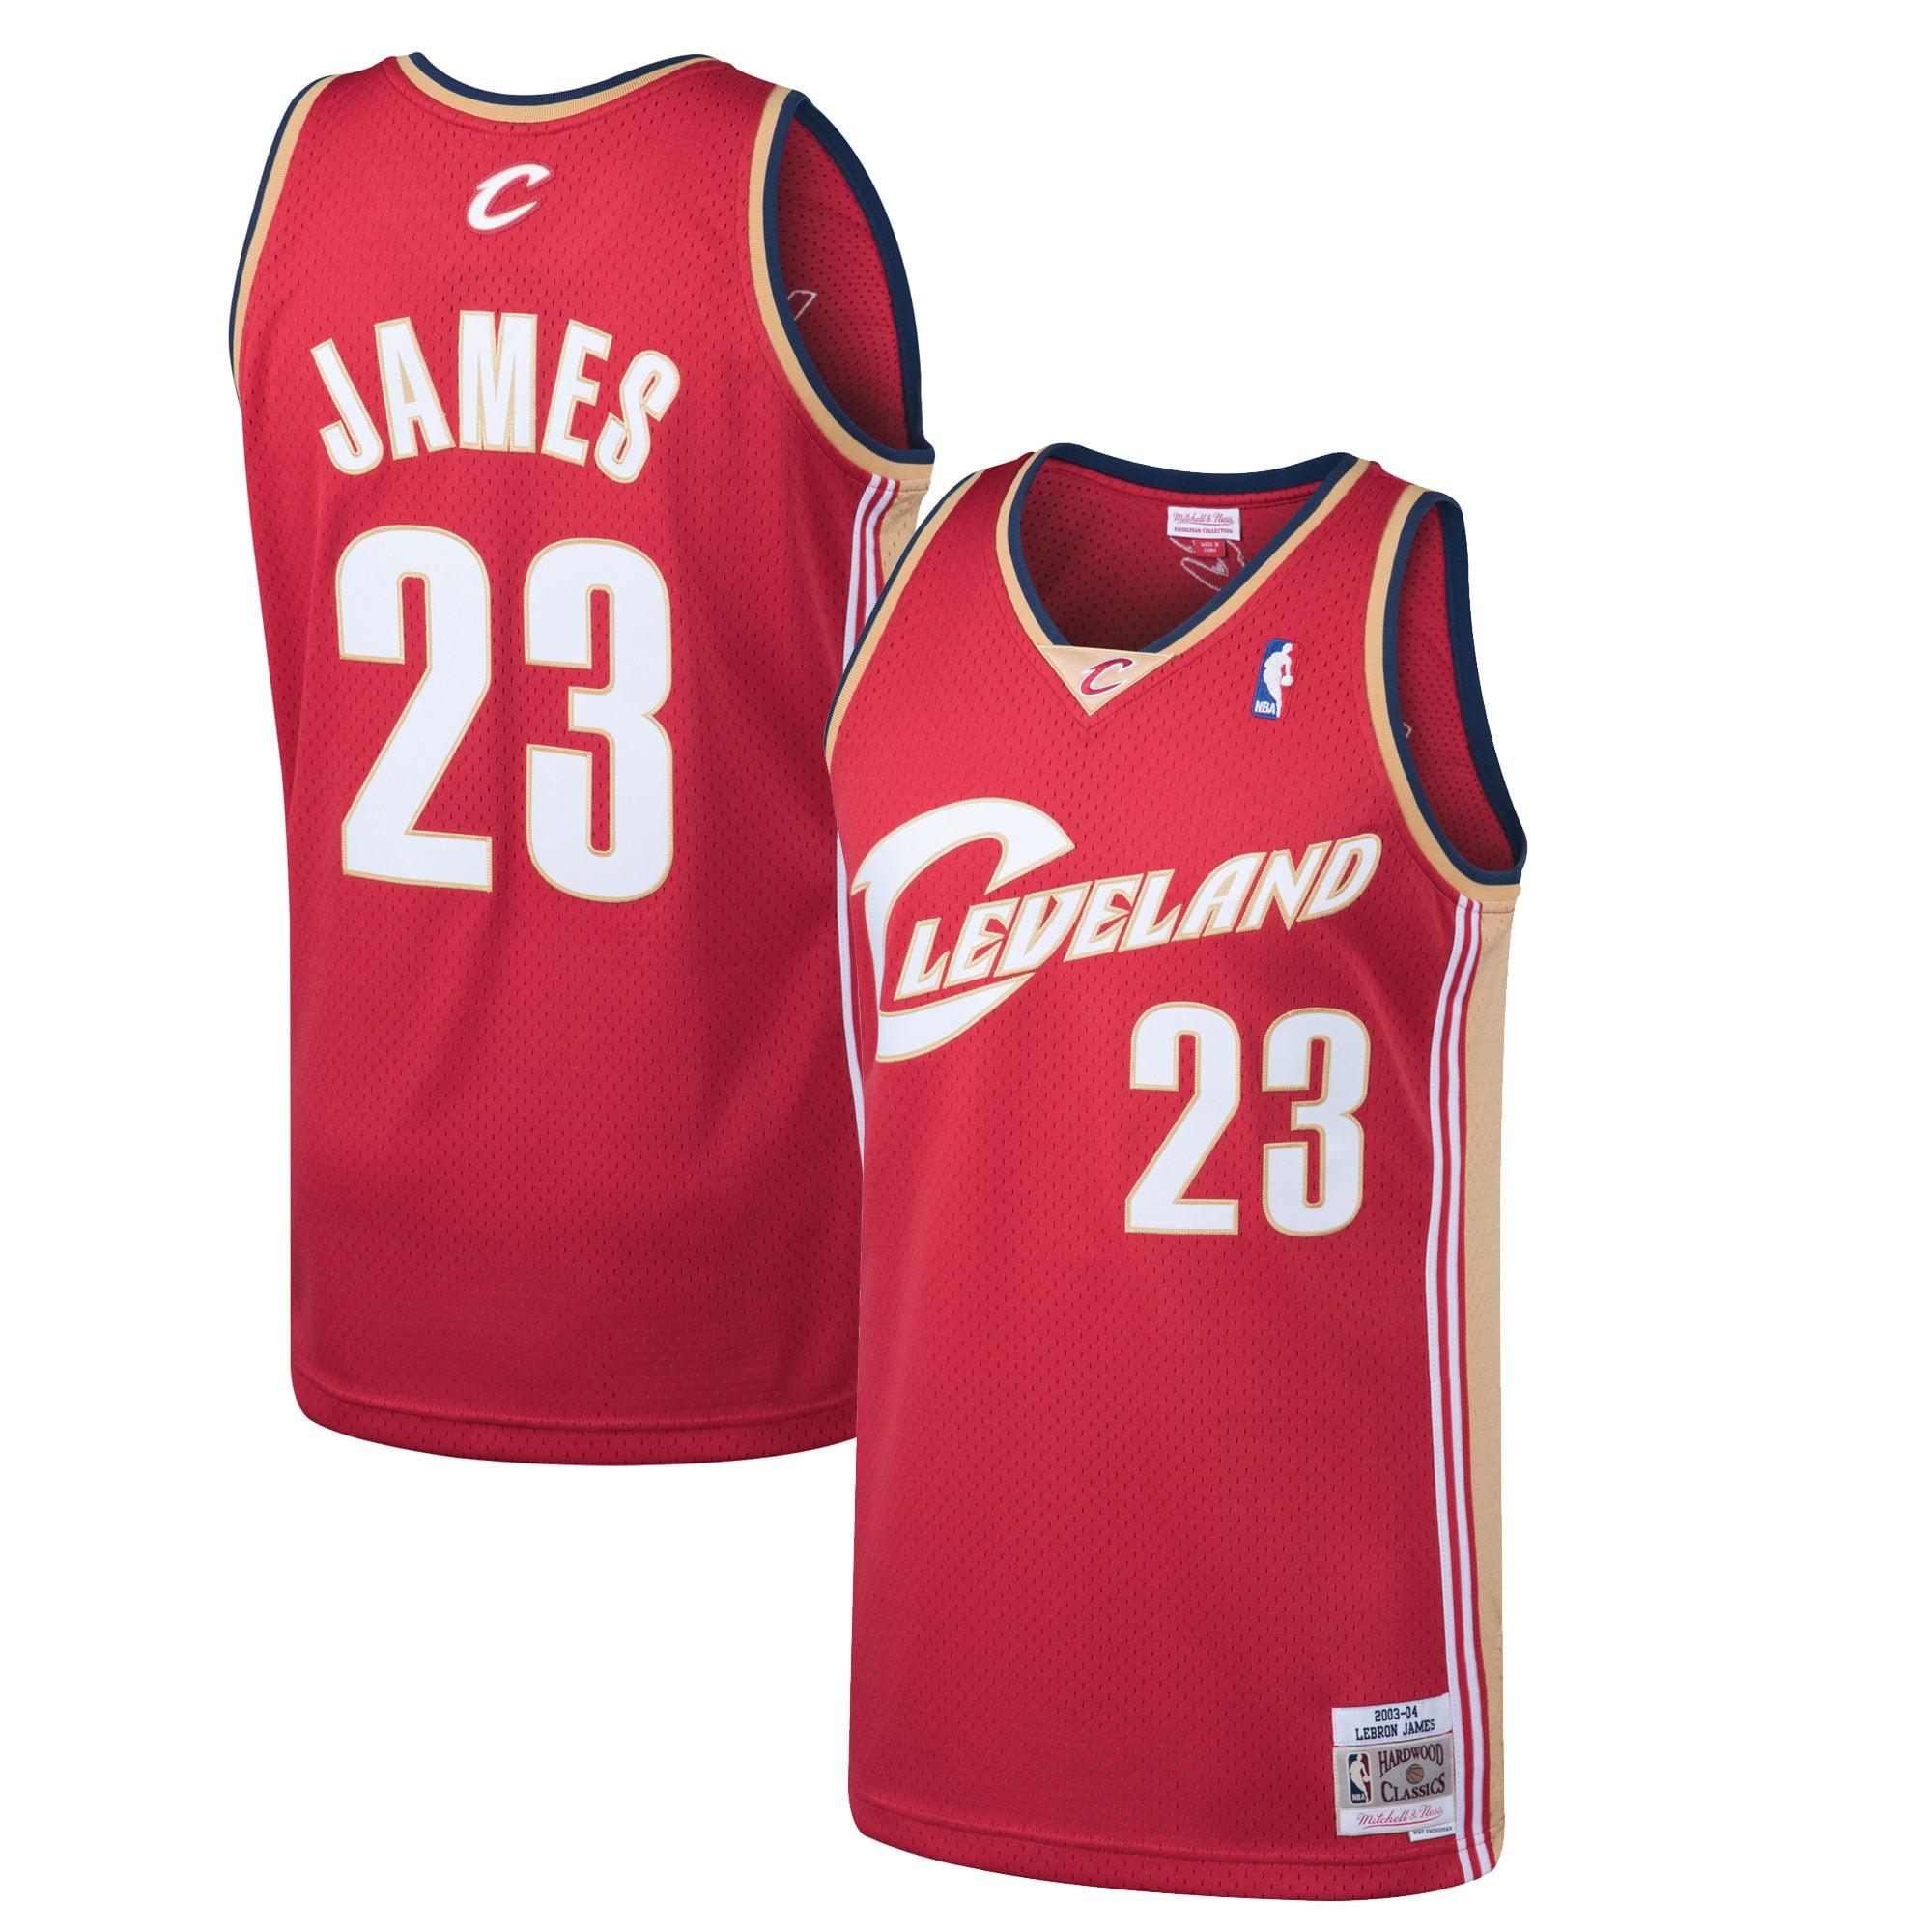 finest selection 3dbc8 cca0e LeBron James Cleveland Cavaliers Mitchell & Ness 2003-04 Hardwood Classics  Swingman Jersey - Wine